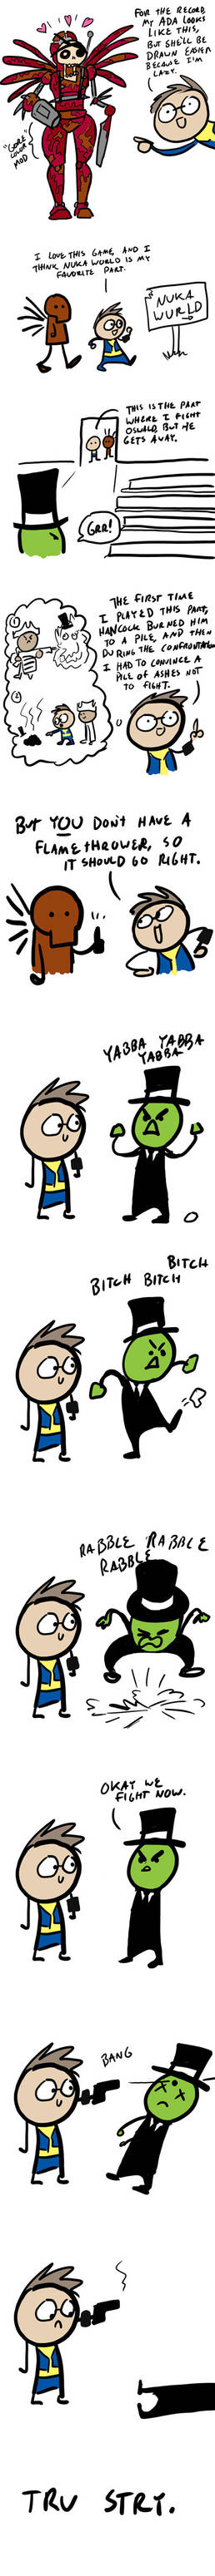 Fallout Comics #61 - Oswald Returns